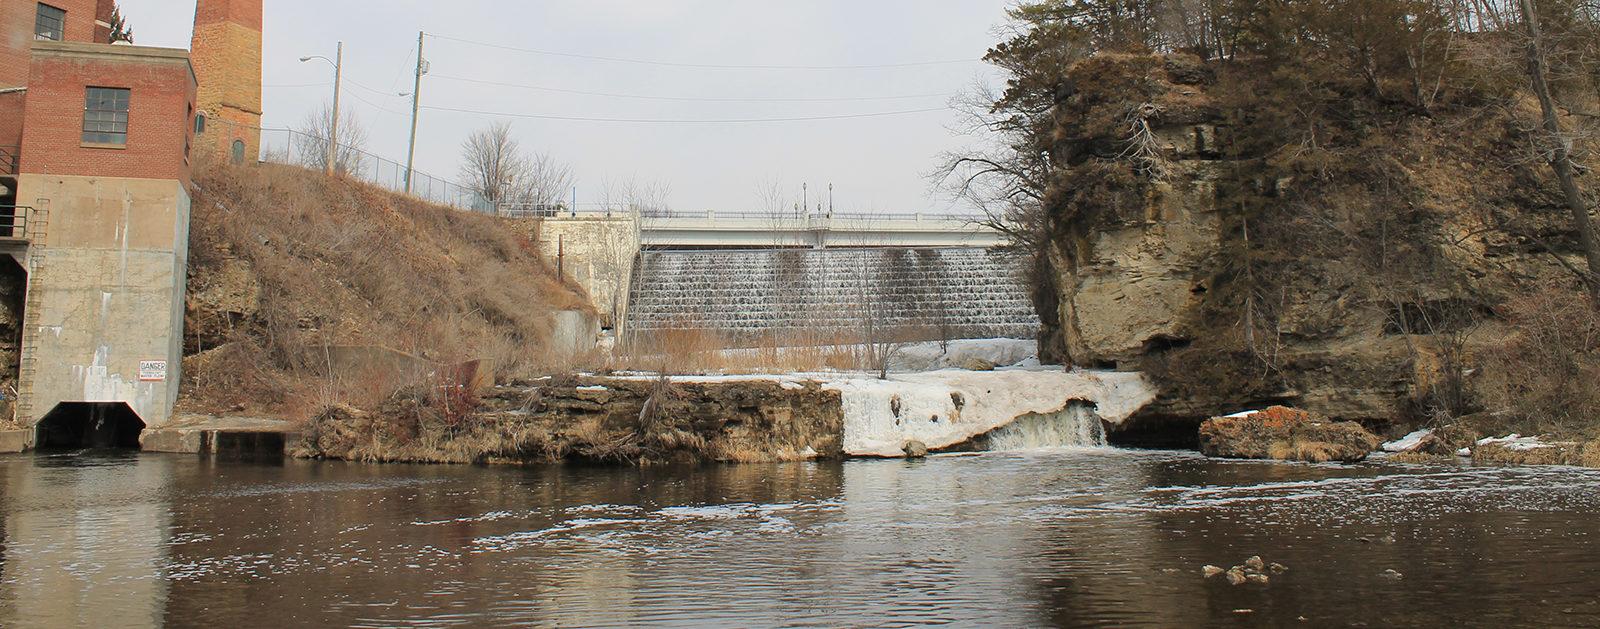 Kinnickinnic River dams. | Photo: Michael Page